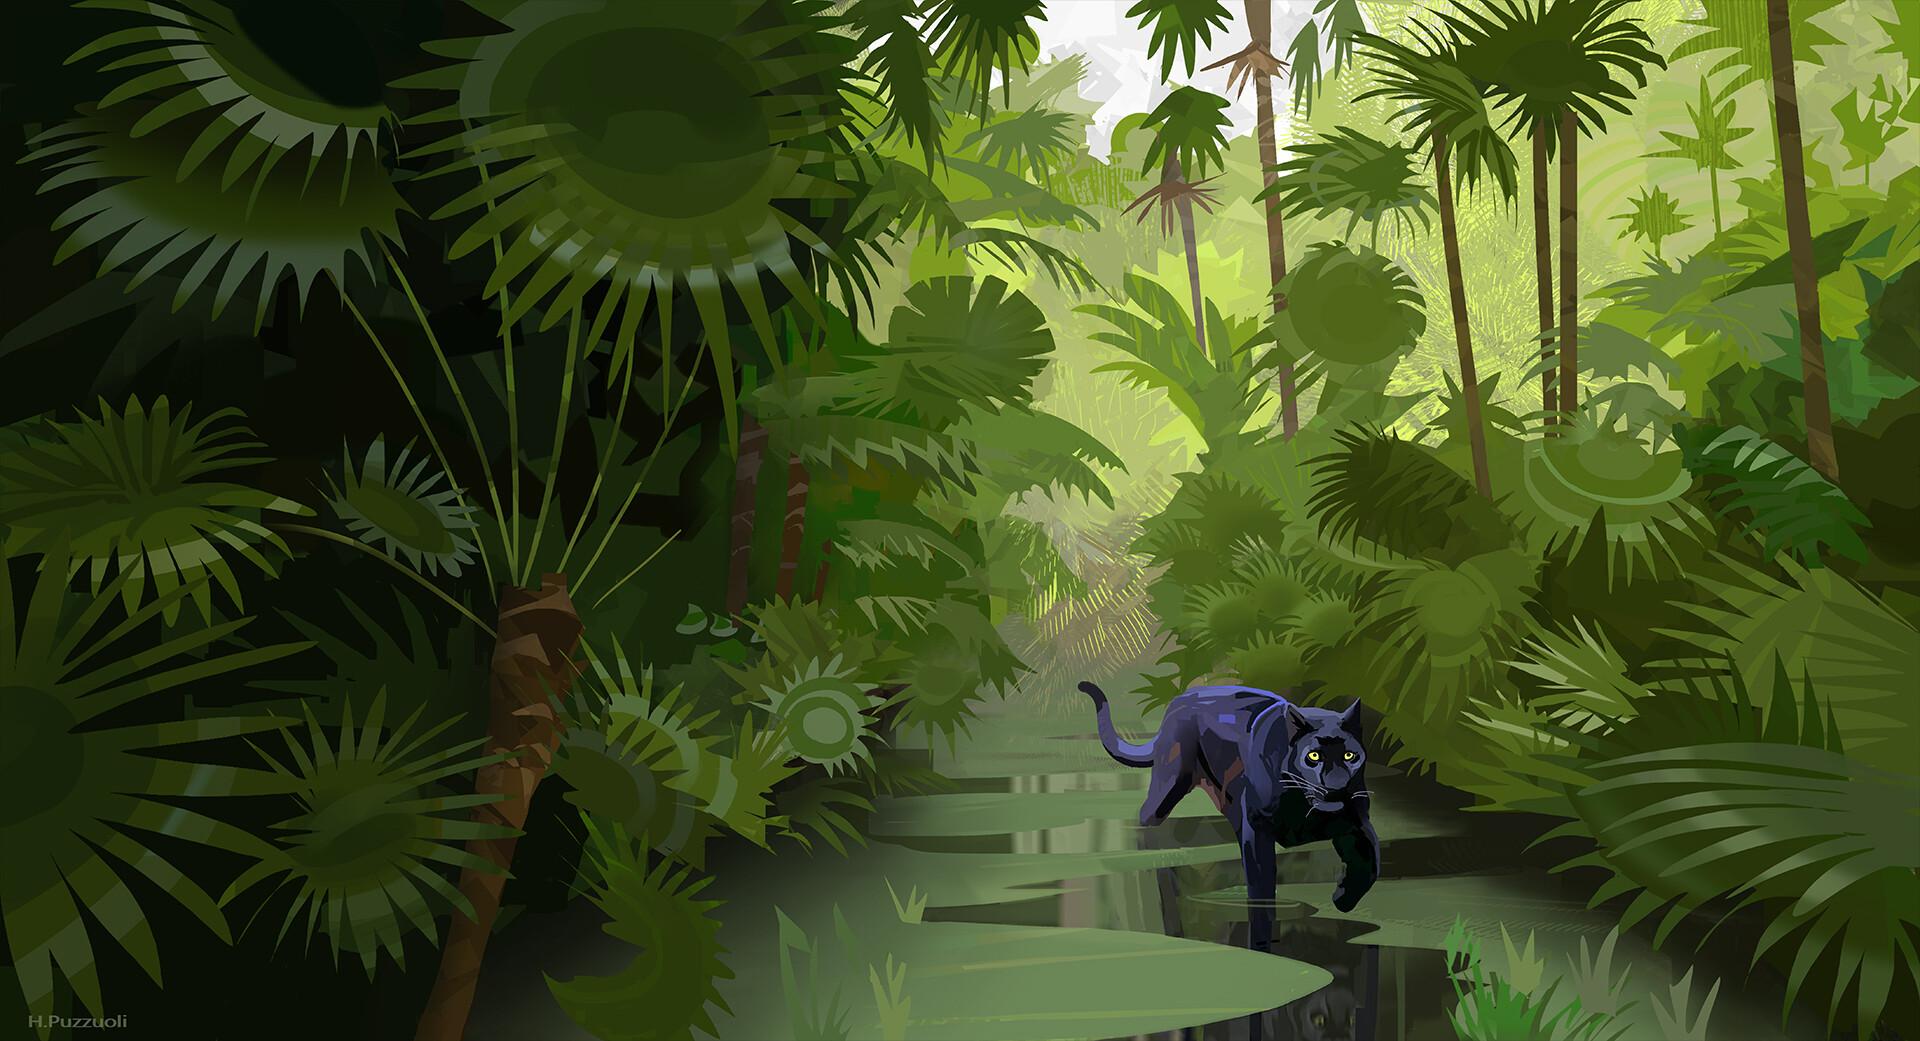 Hugo puzzuoli jungle01 final small